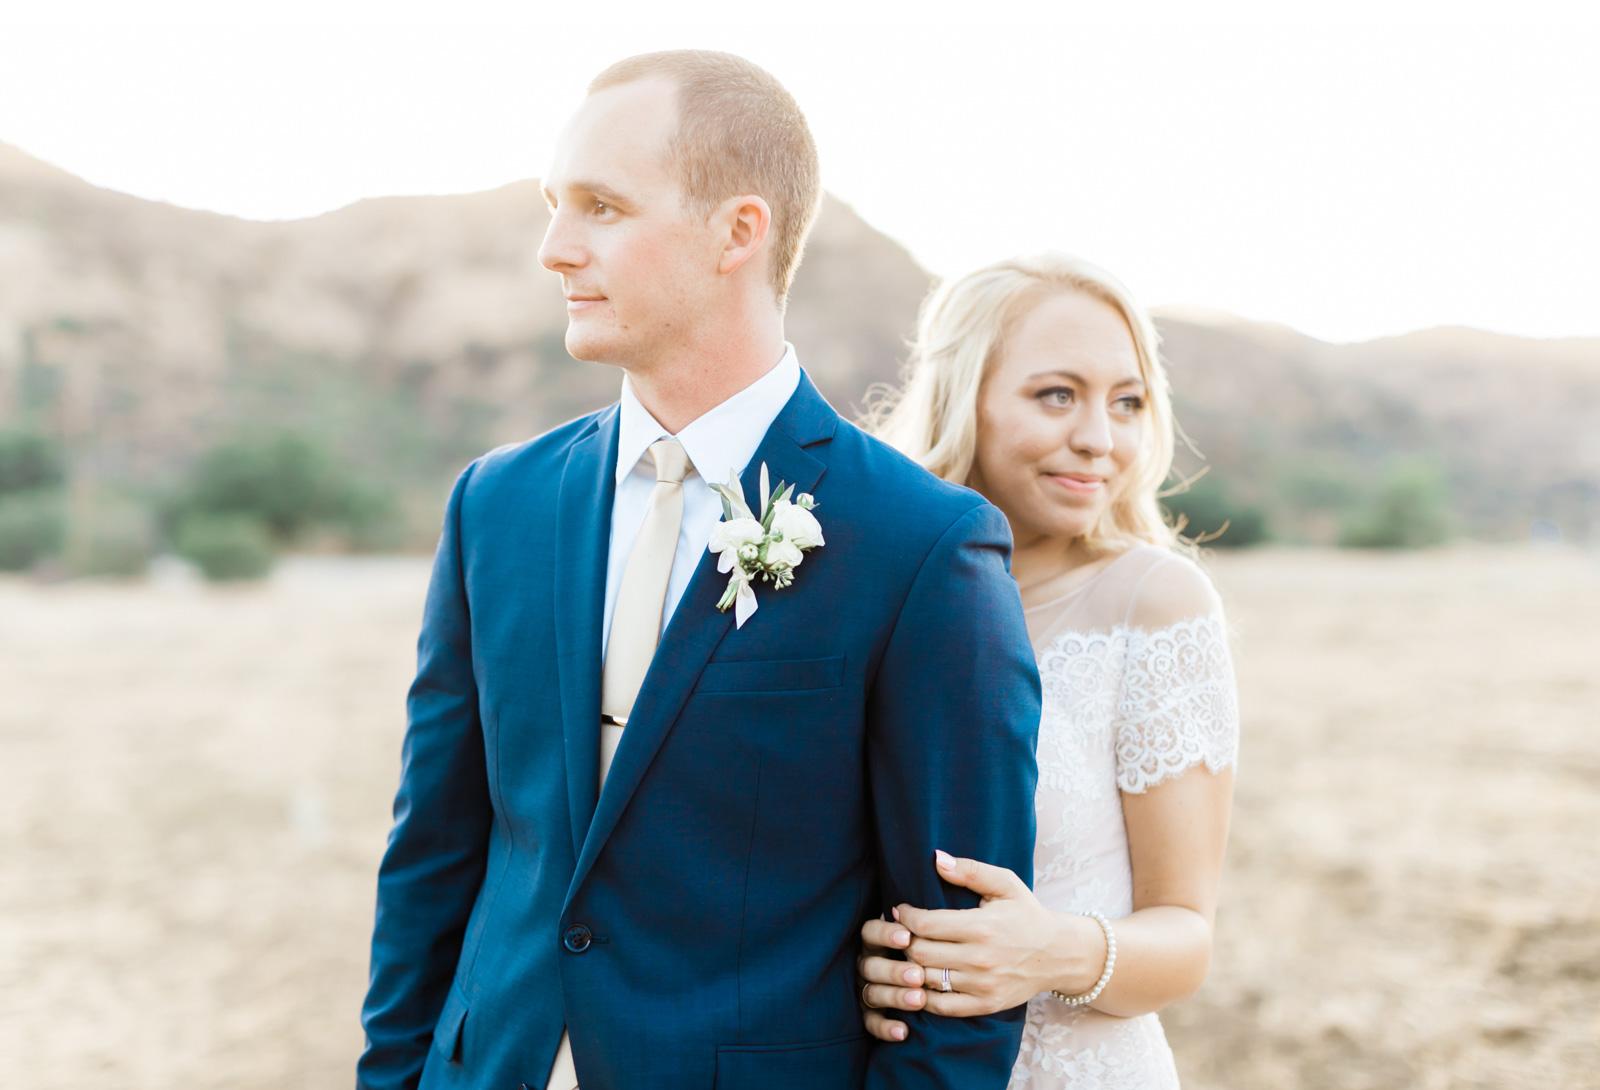 California-Wedding-Photographer-Style-Me-Pretty-Natalie-Schutt-San-Luis-Obispo_05.jpg